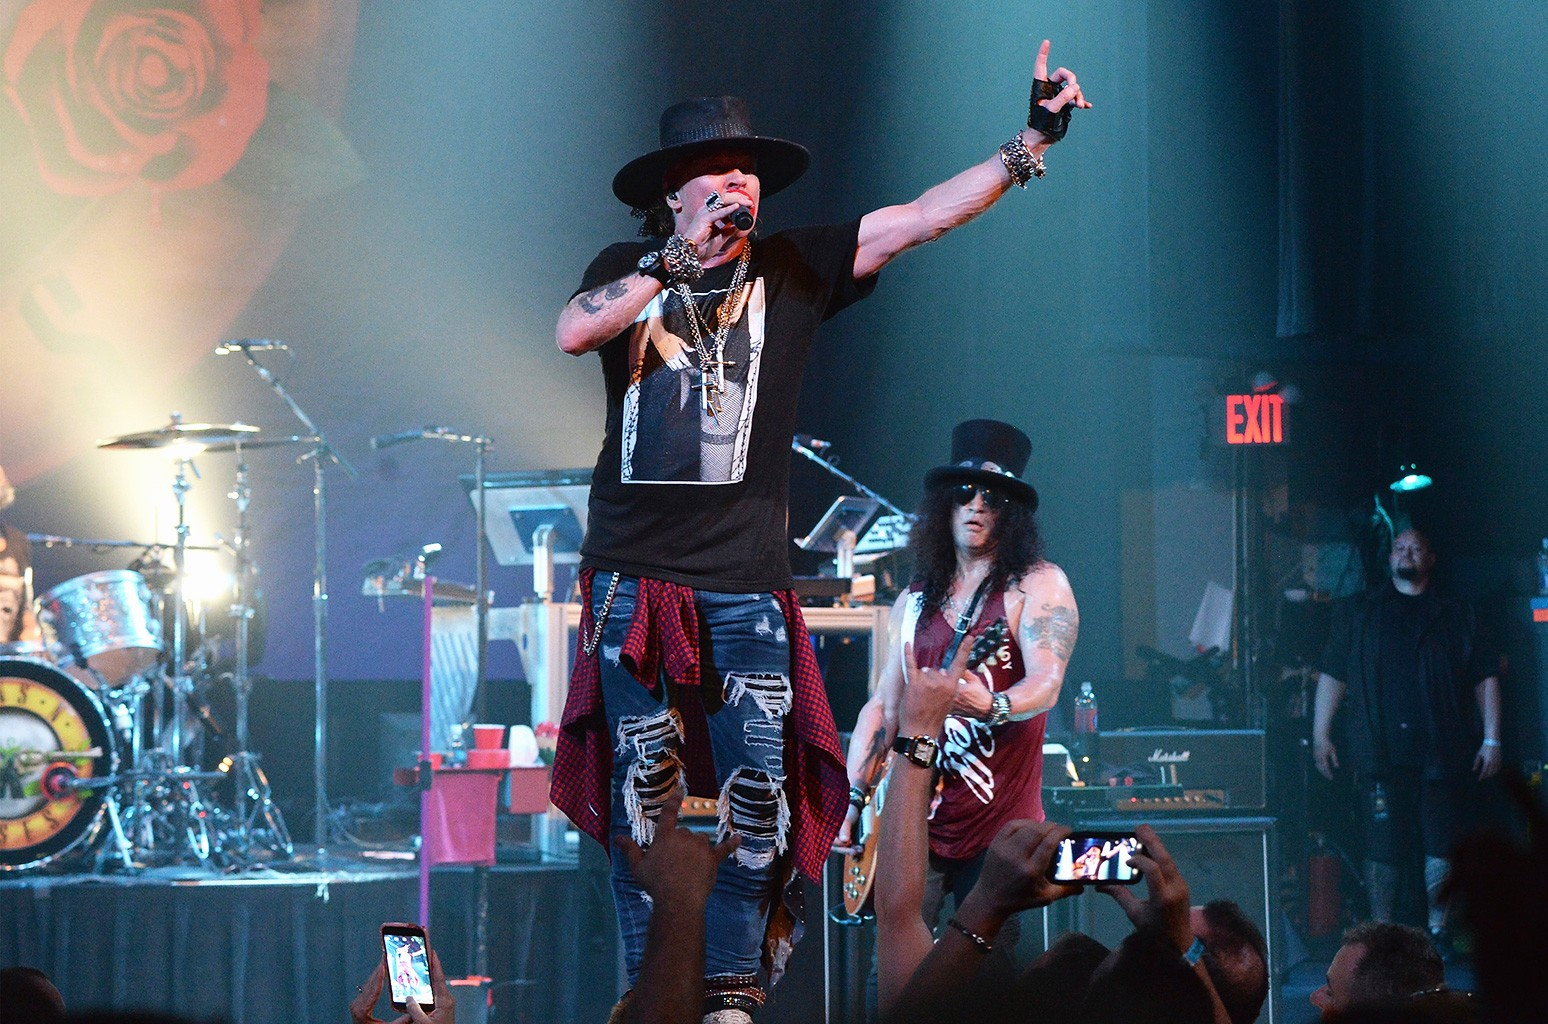 Axl Rose (L) and Slash of Guns N' Roses